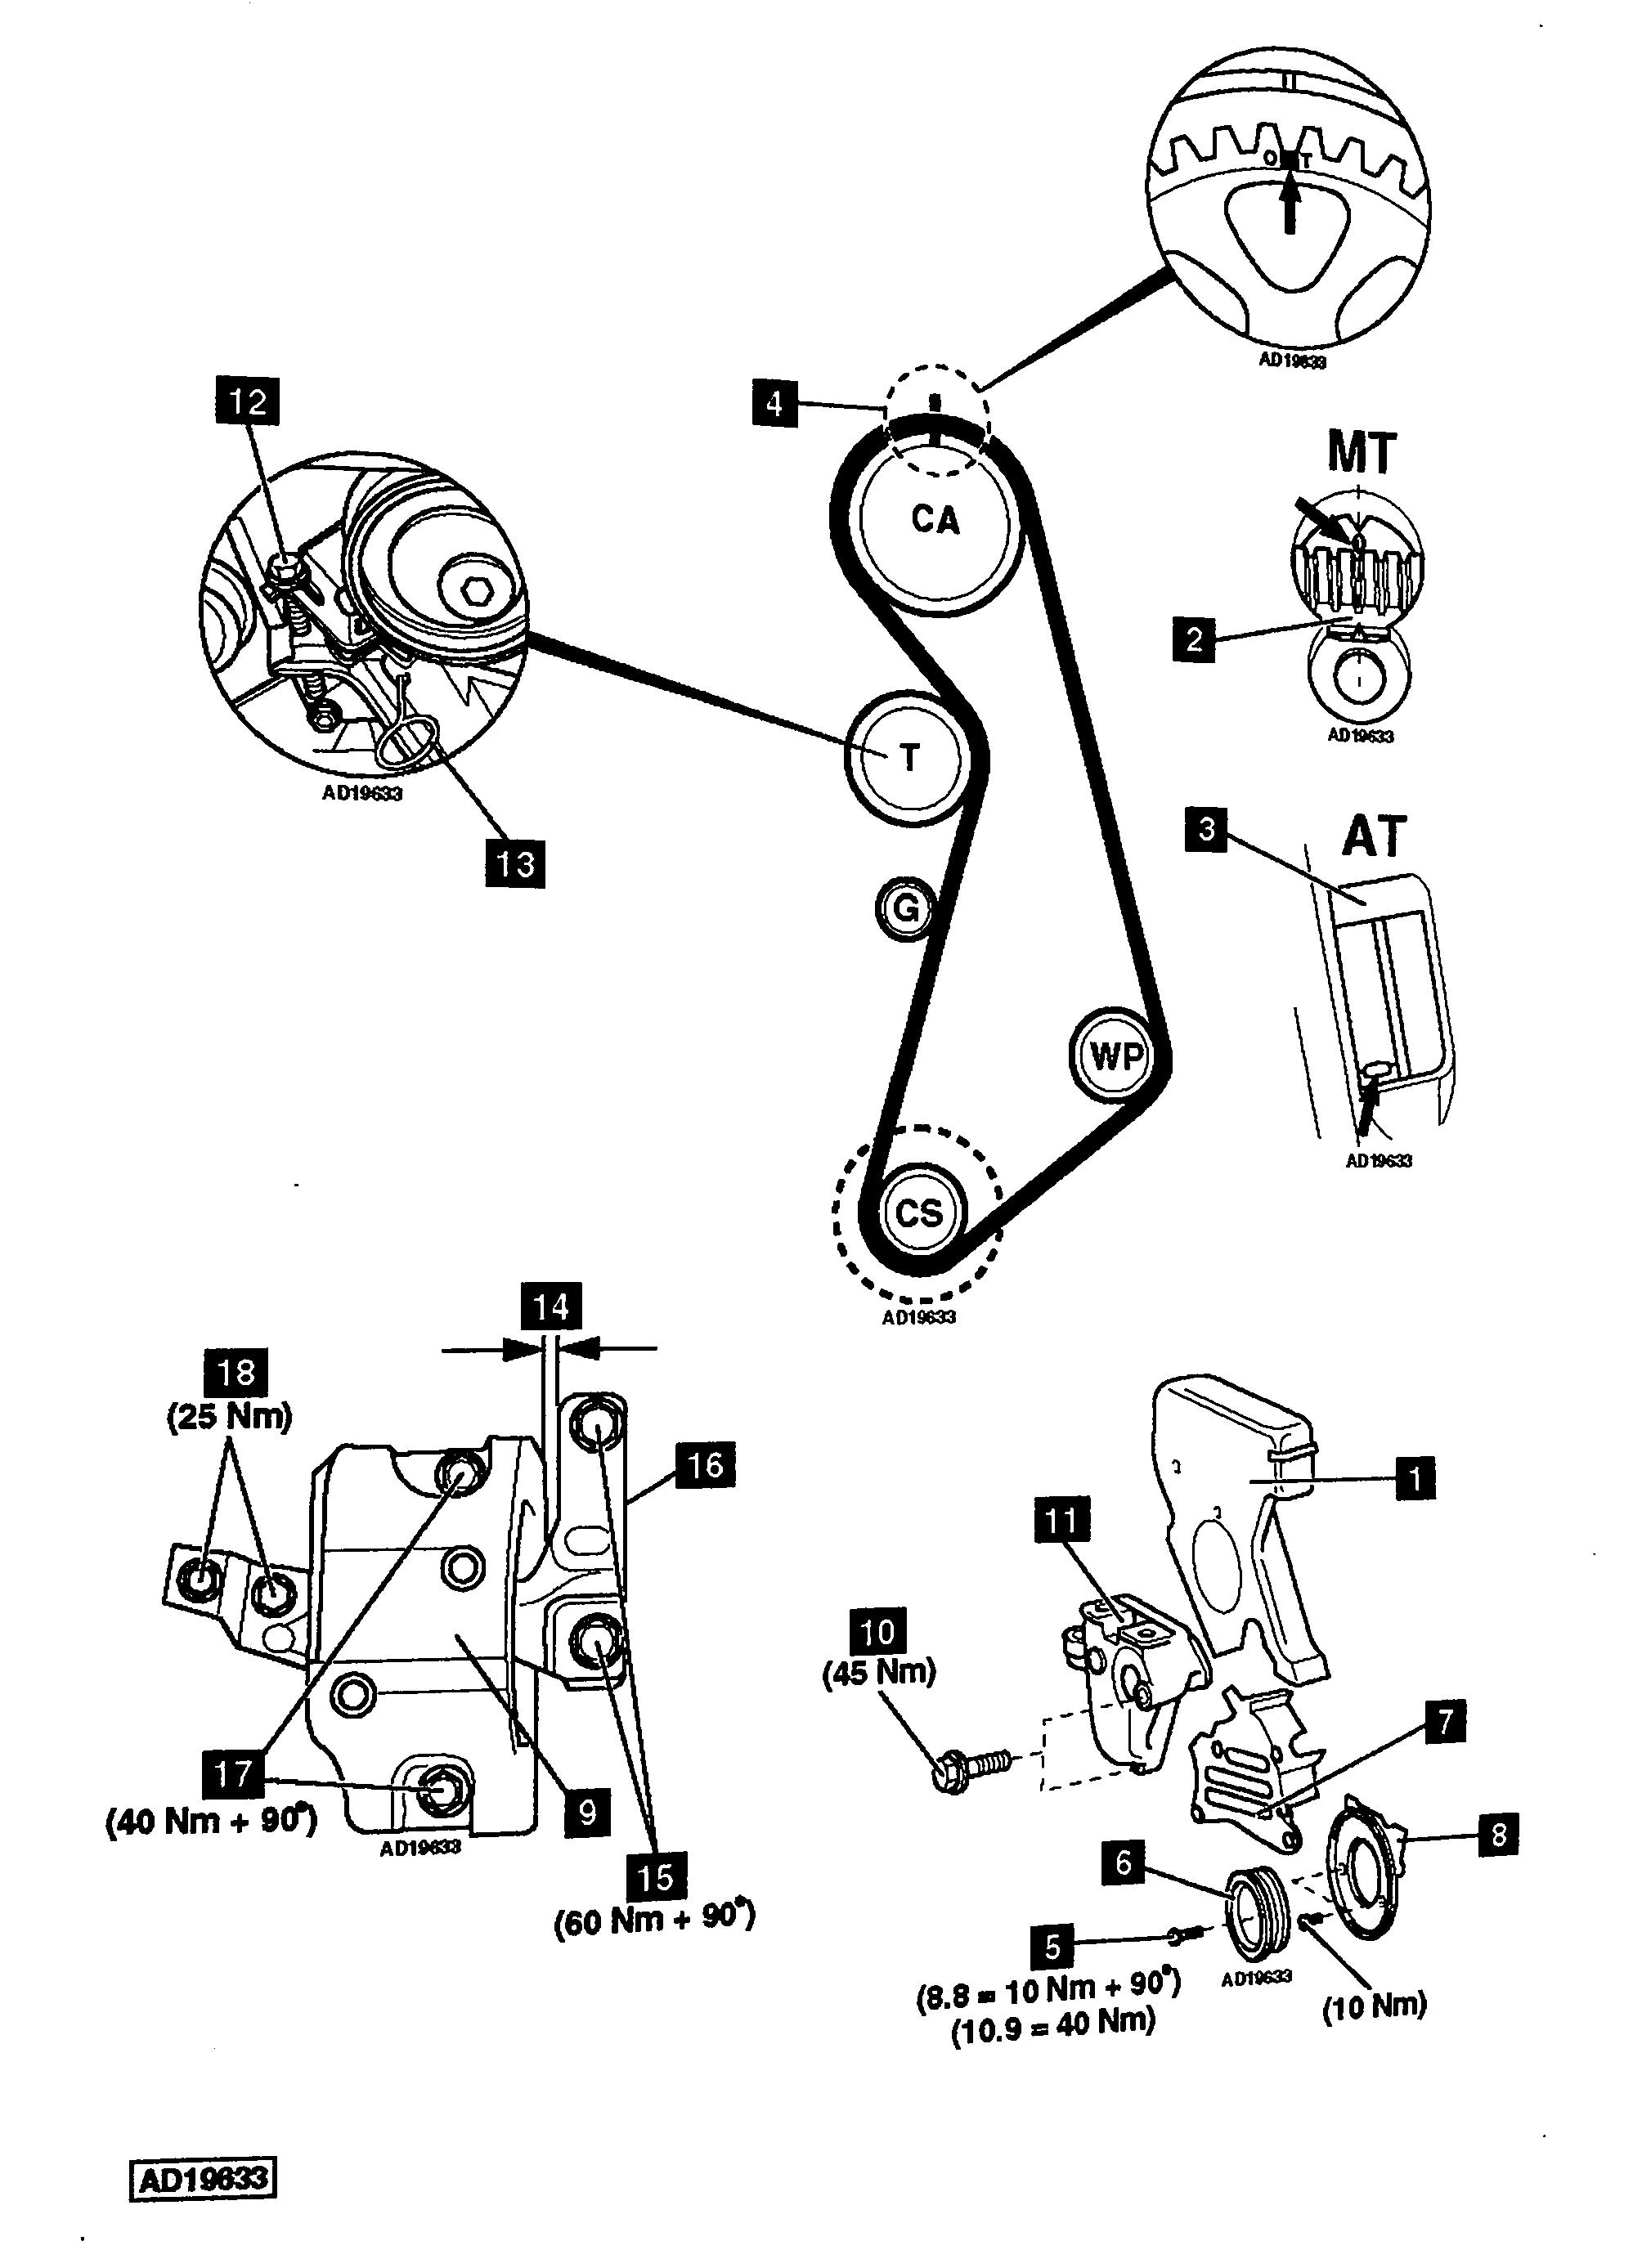 1997 Saturn Sc2 Timing Belt